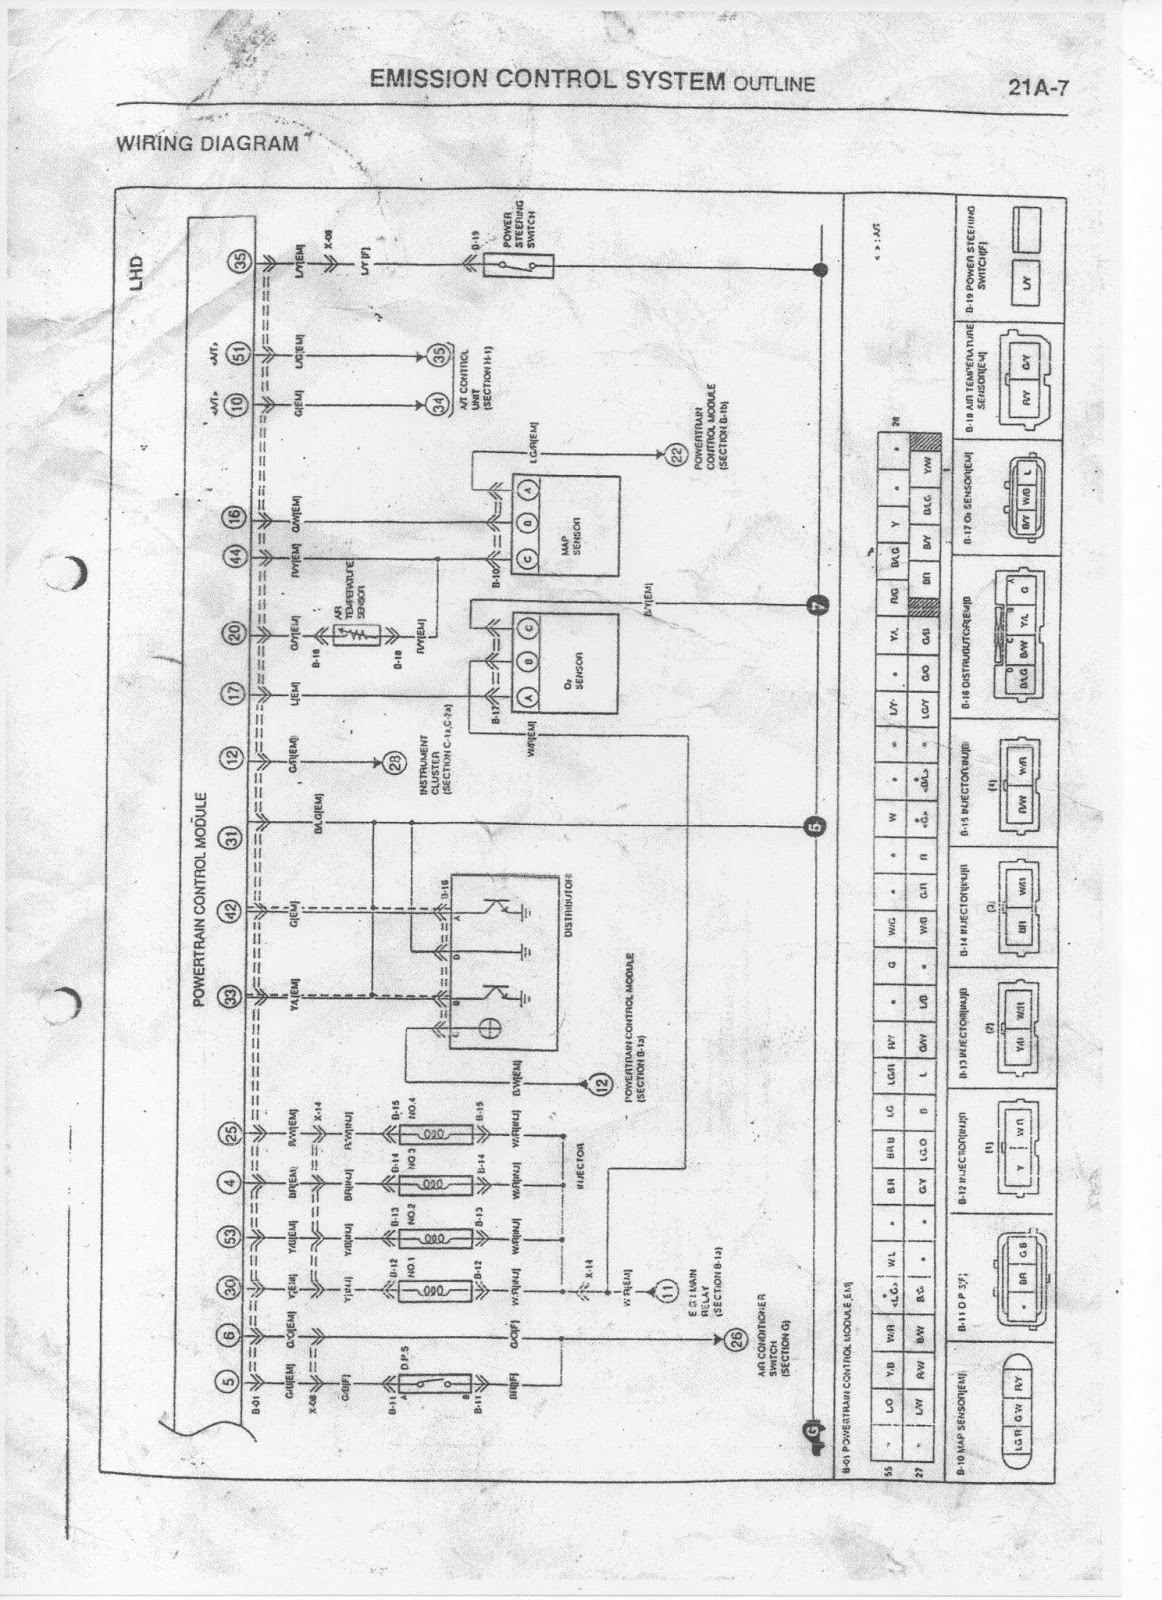 hight resolution of wiring diagram kia sephia master mobil efiwiring diagram kia sephia